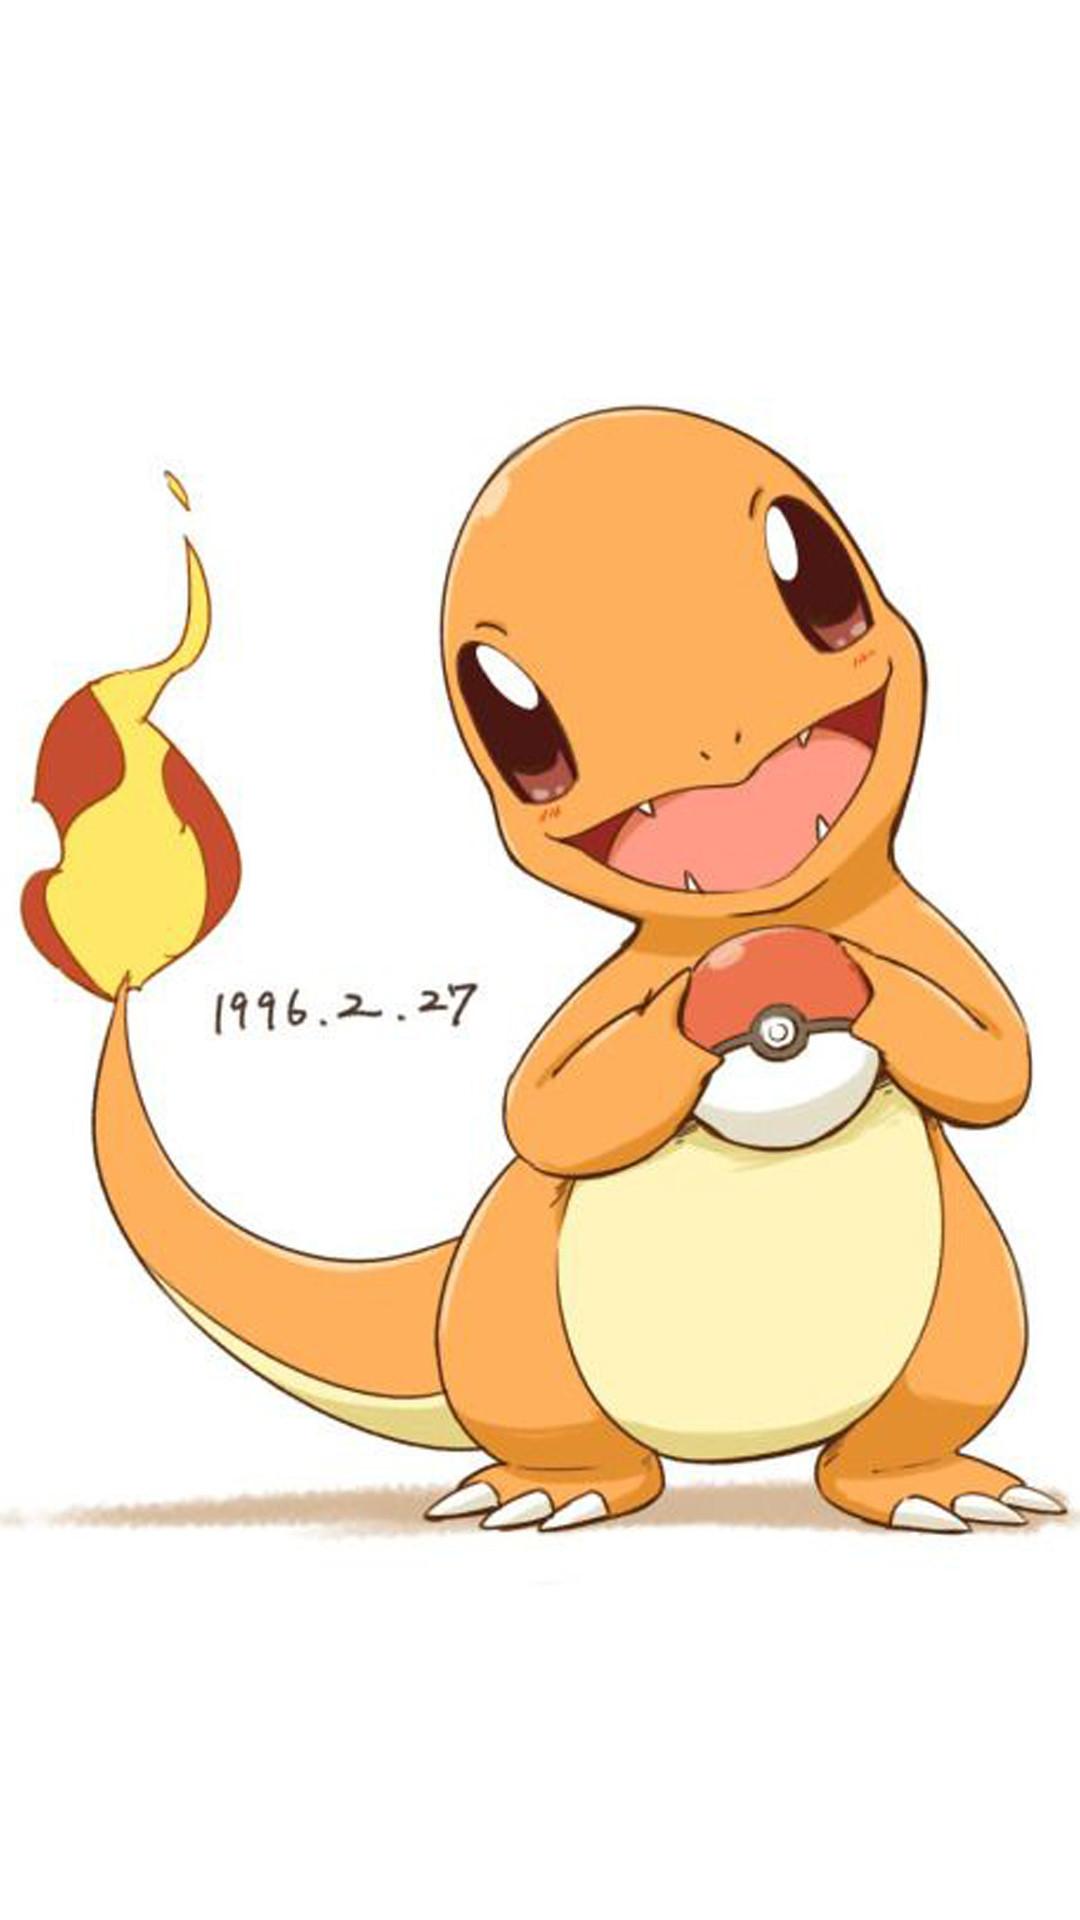 Charmander Pokemon Go iphone wallpaper ios 8